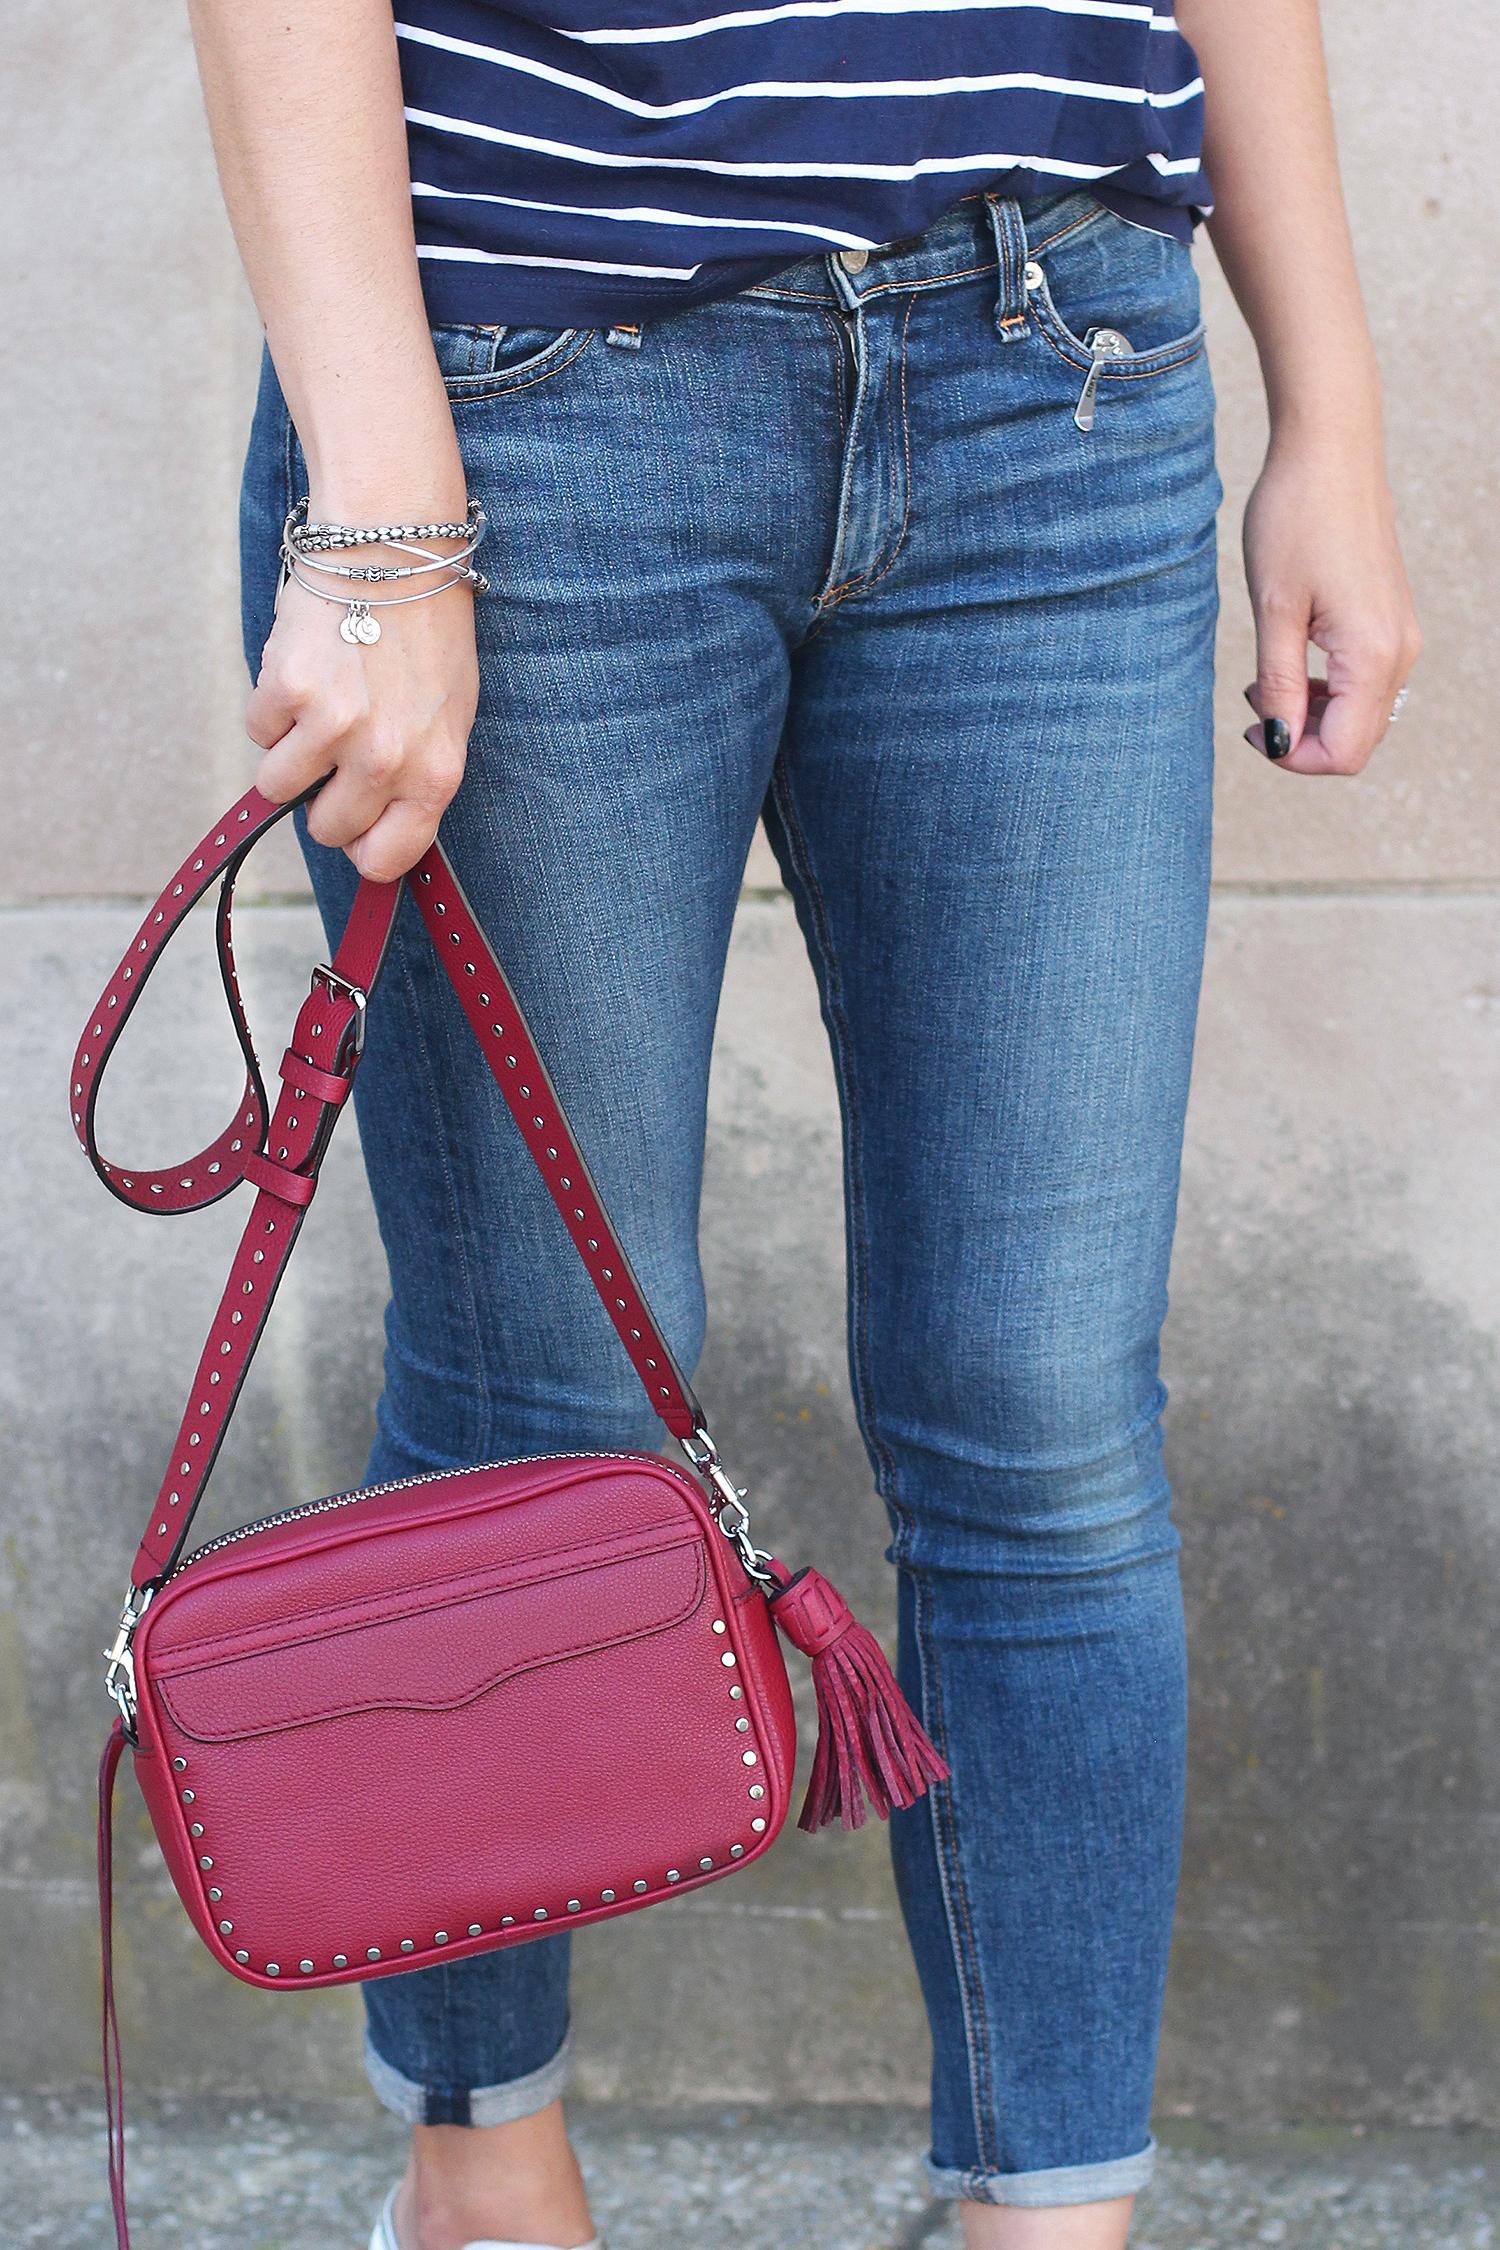 Red Crossbody Bag, Rag and Bone Jeans